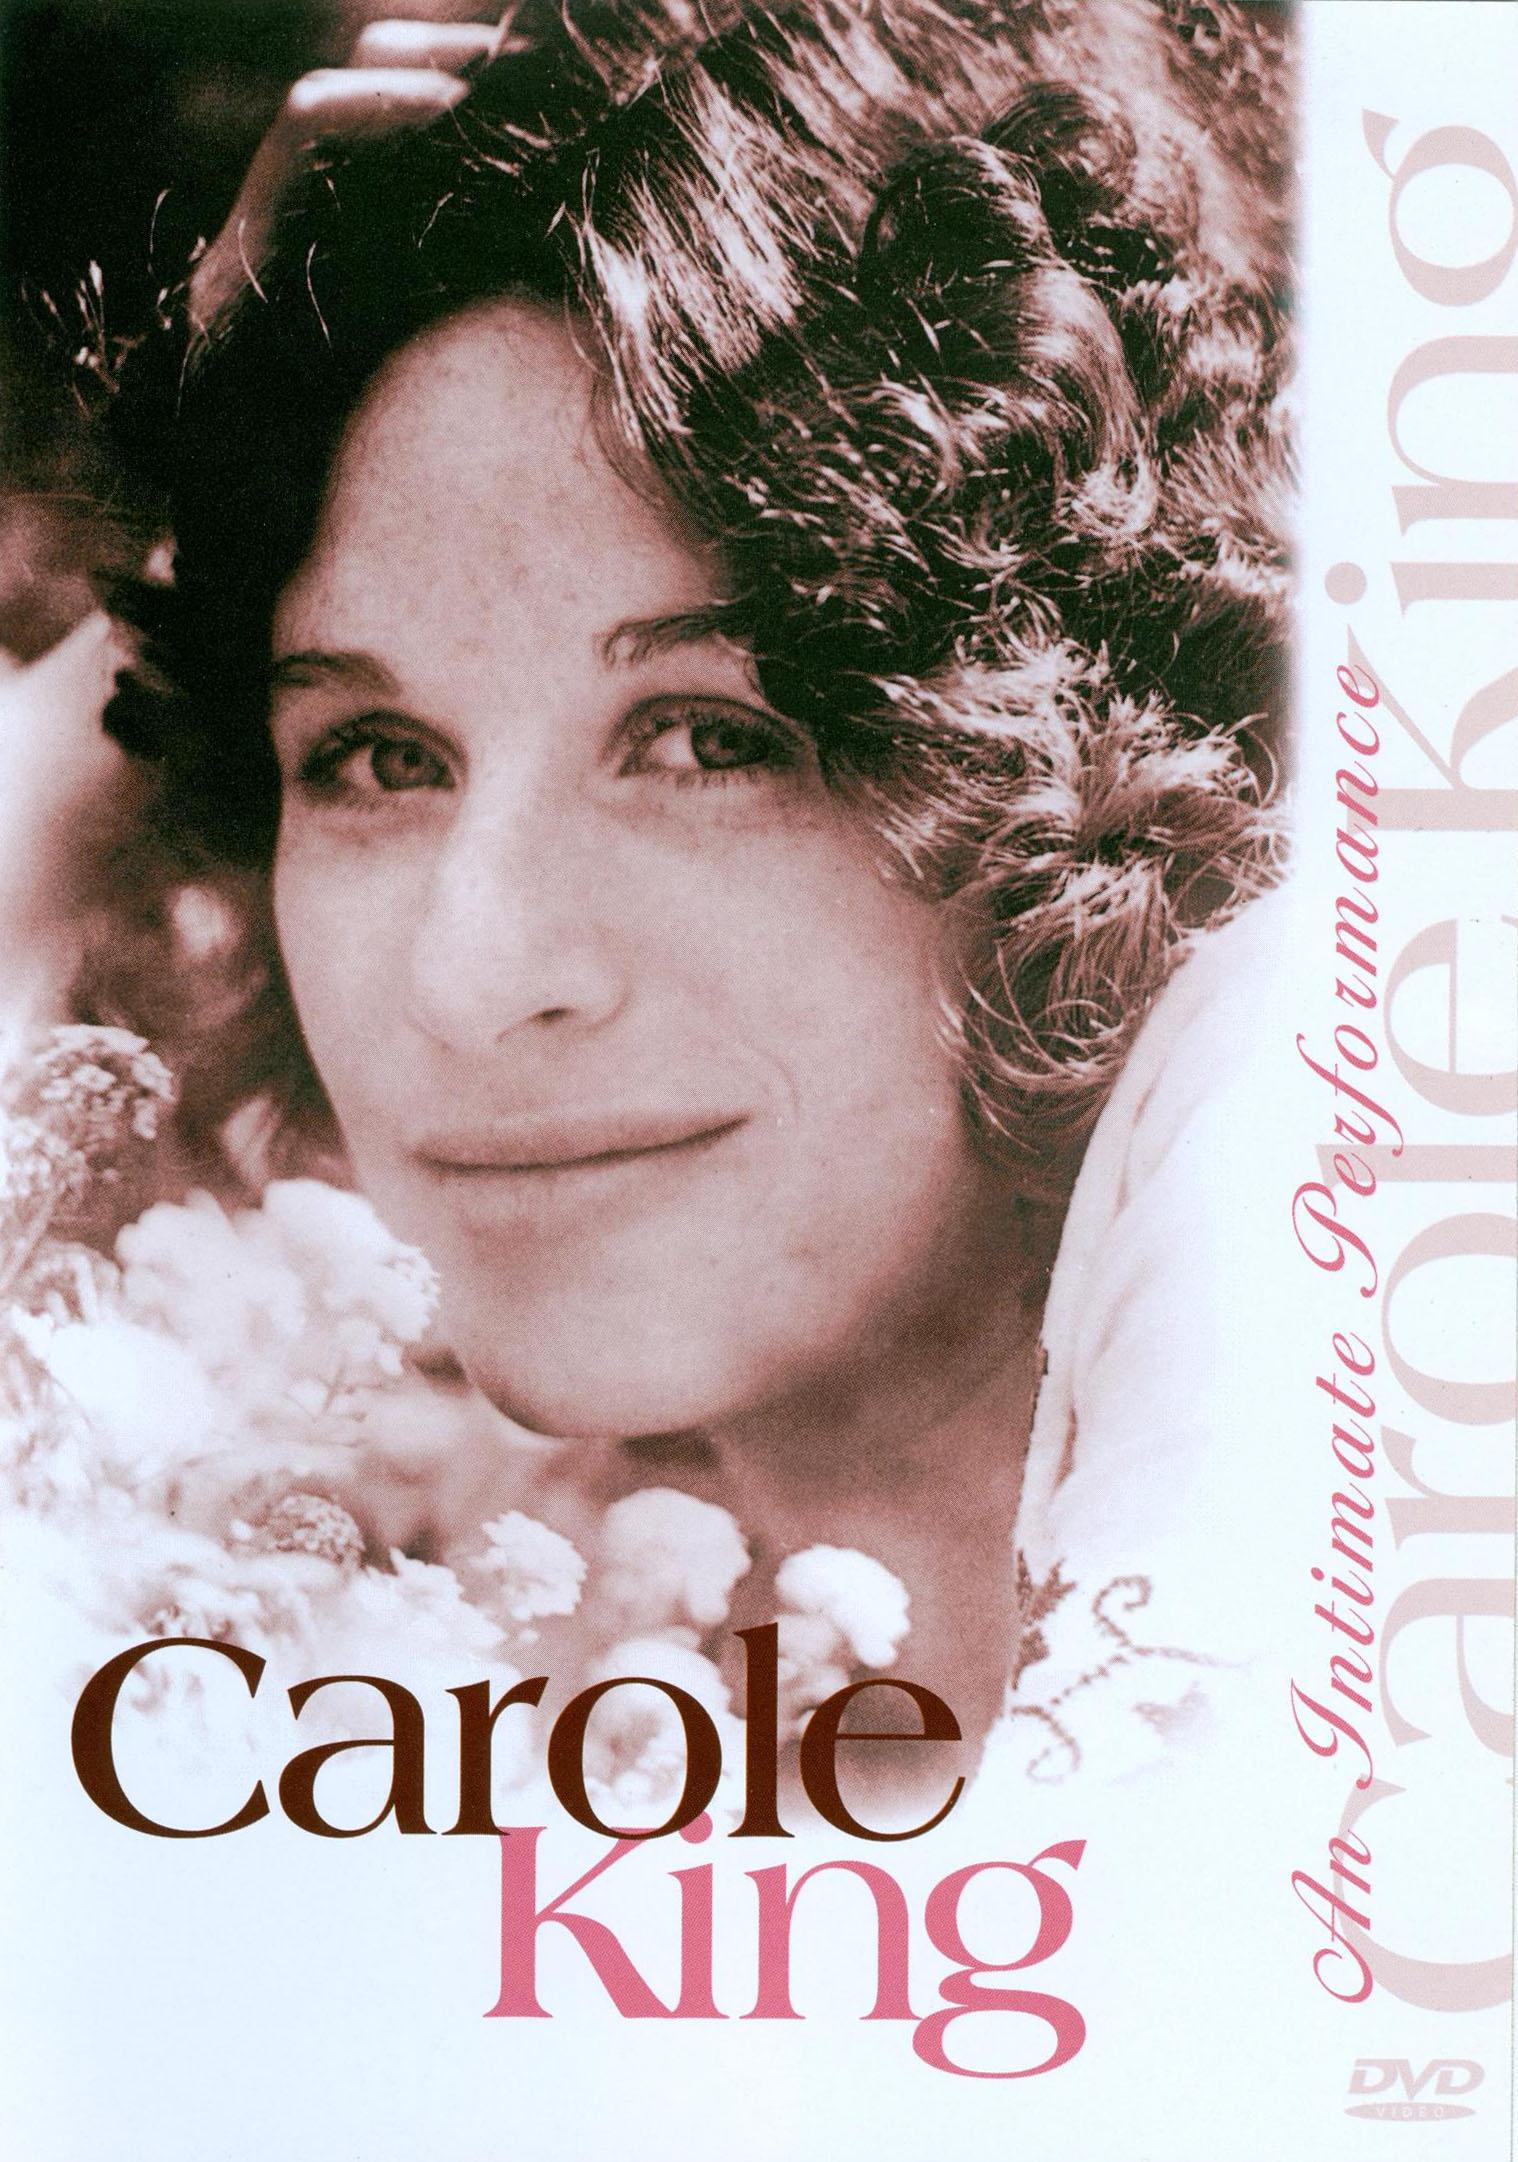 Carole King: An Intimate Performance